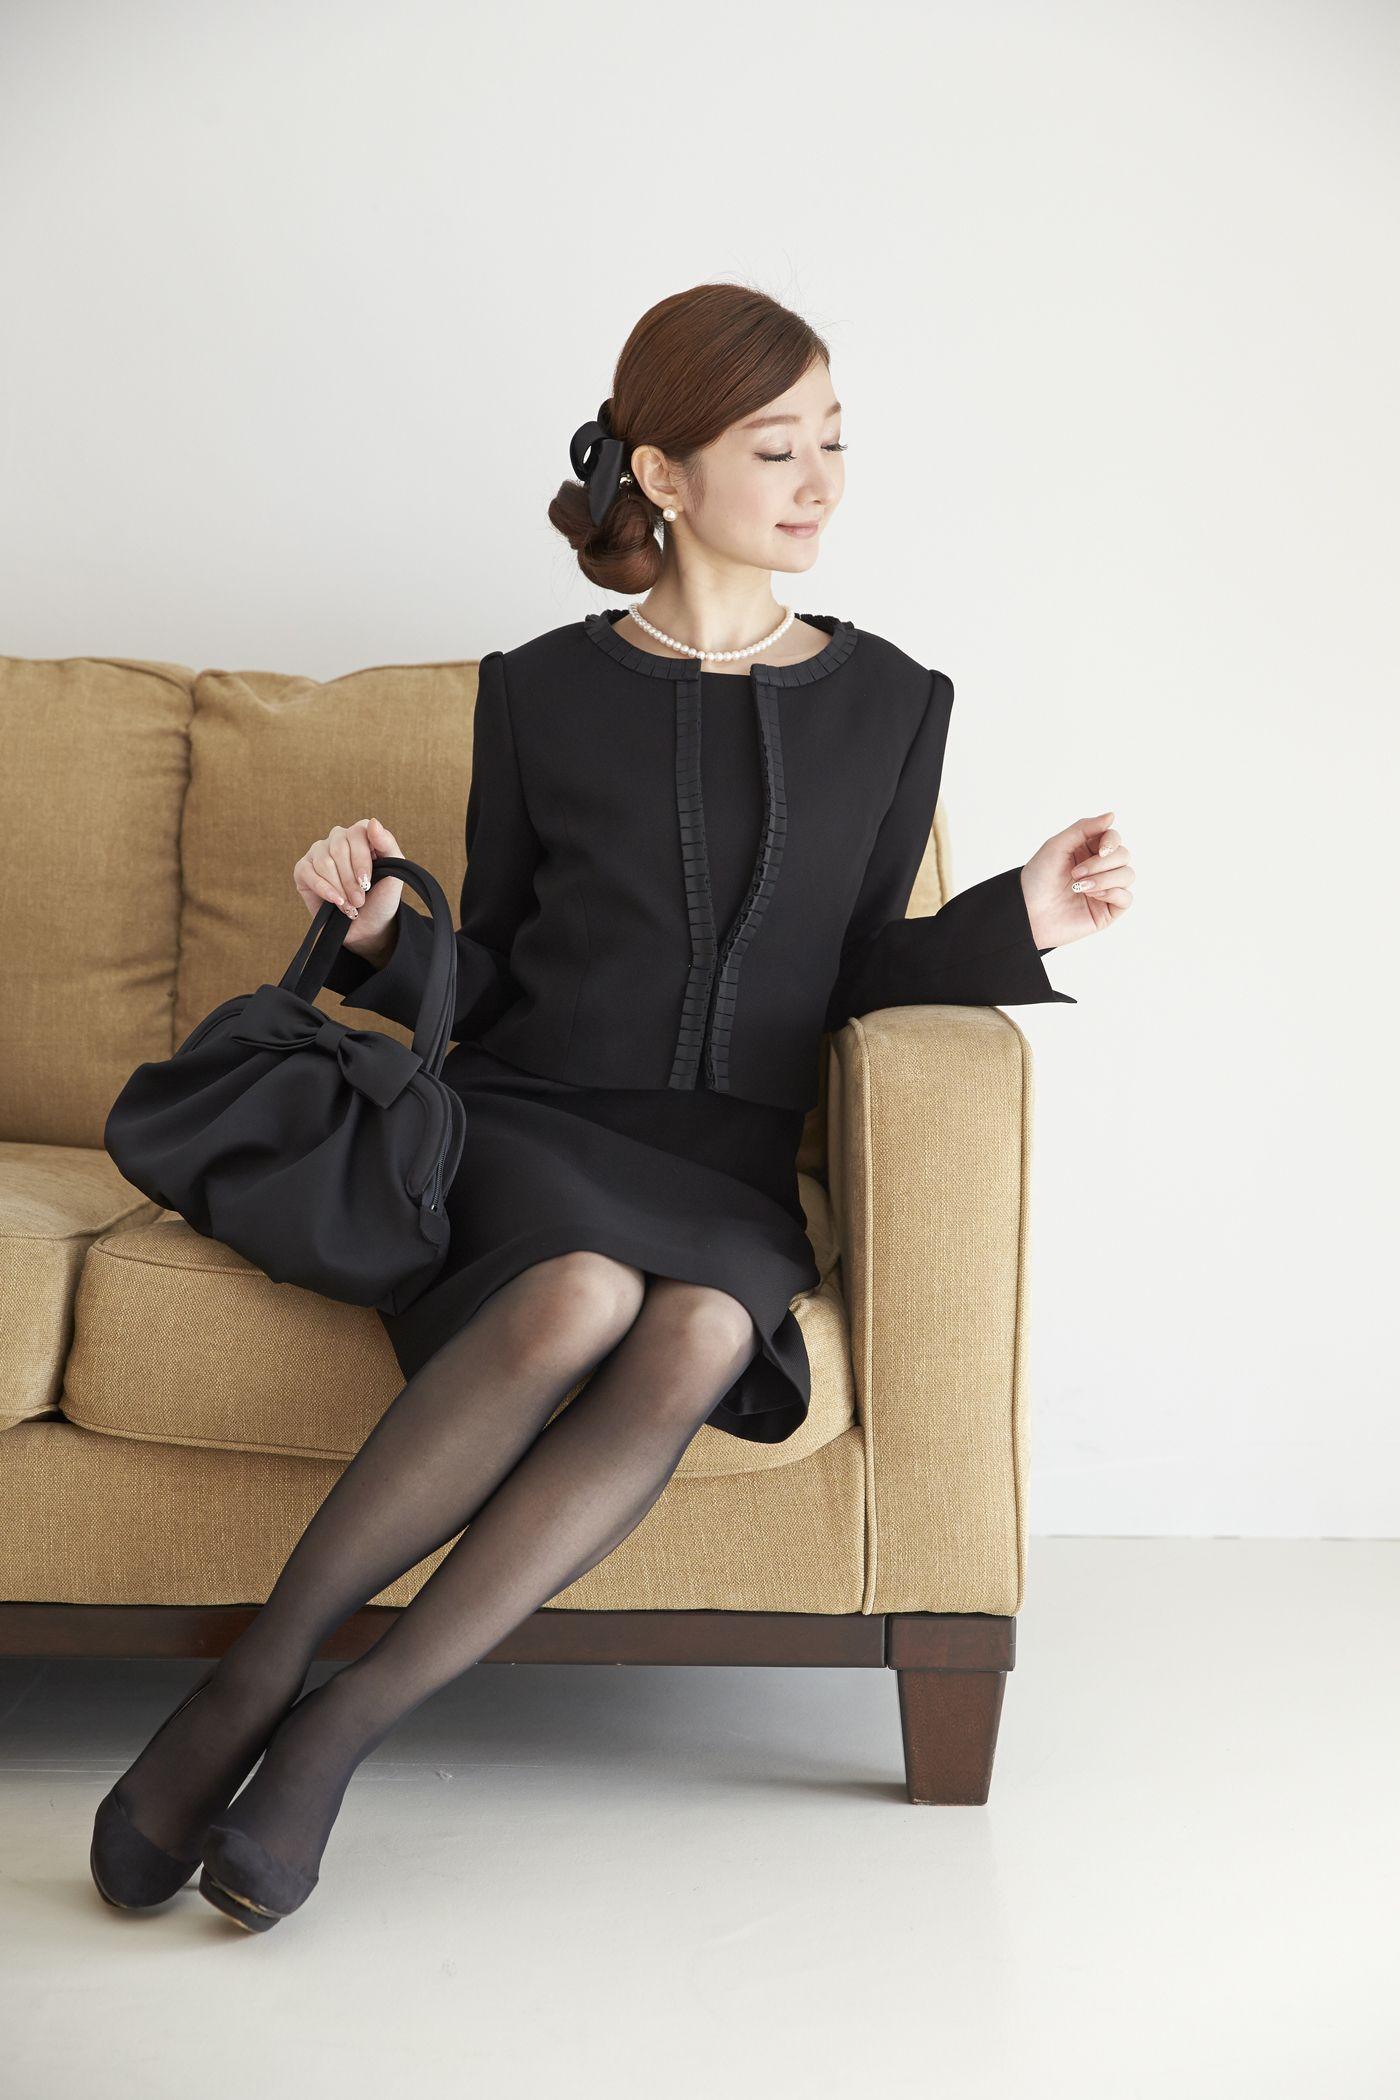 ensemble http www monoir jp product item fx4f002a asp 喪服 礼服 フォーマルウェア専門のファッションサイト monoir モノワール です 礼服 レディース 喪服 女性 喪服 レディース